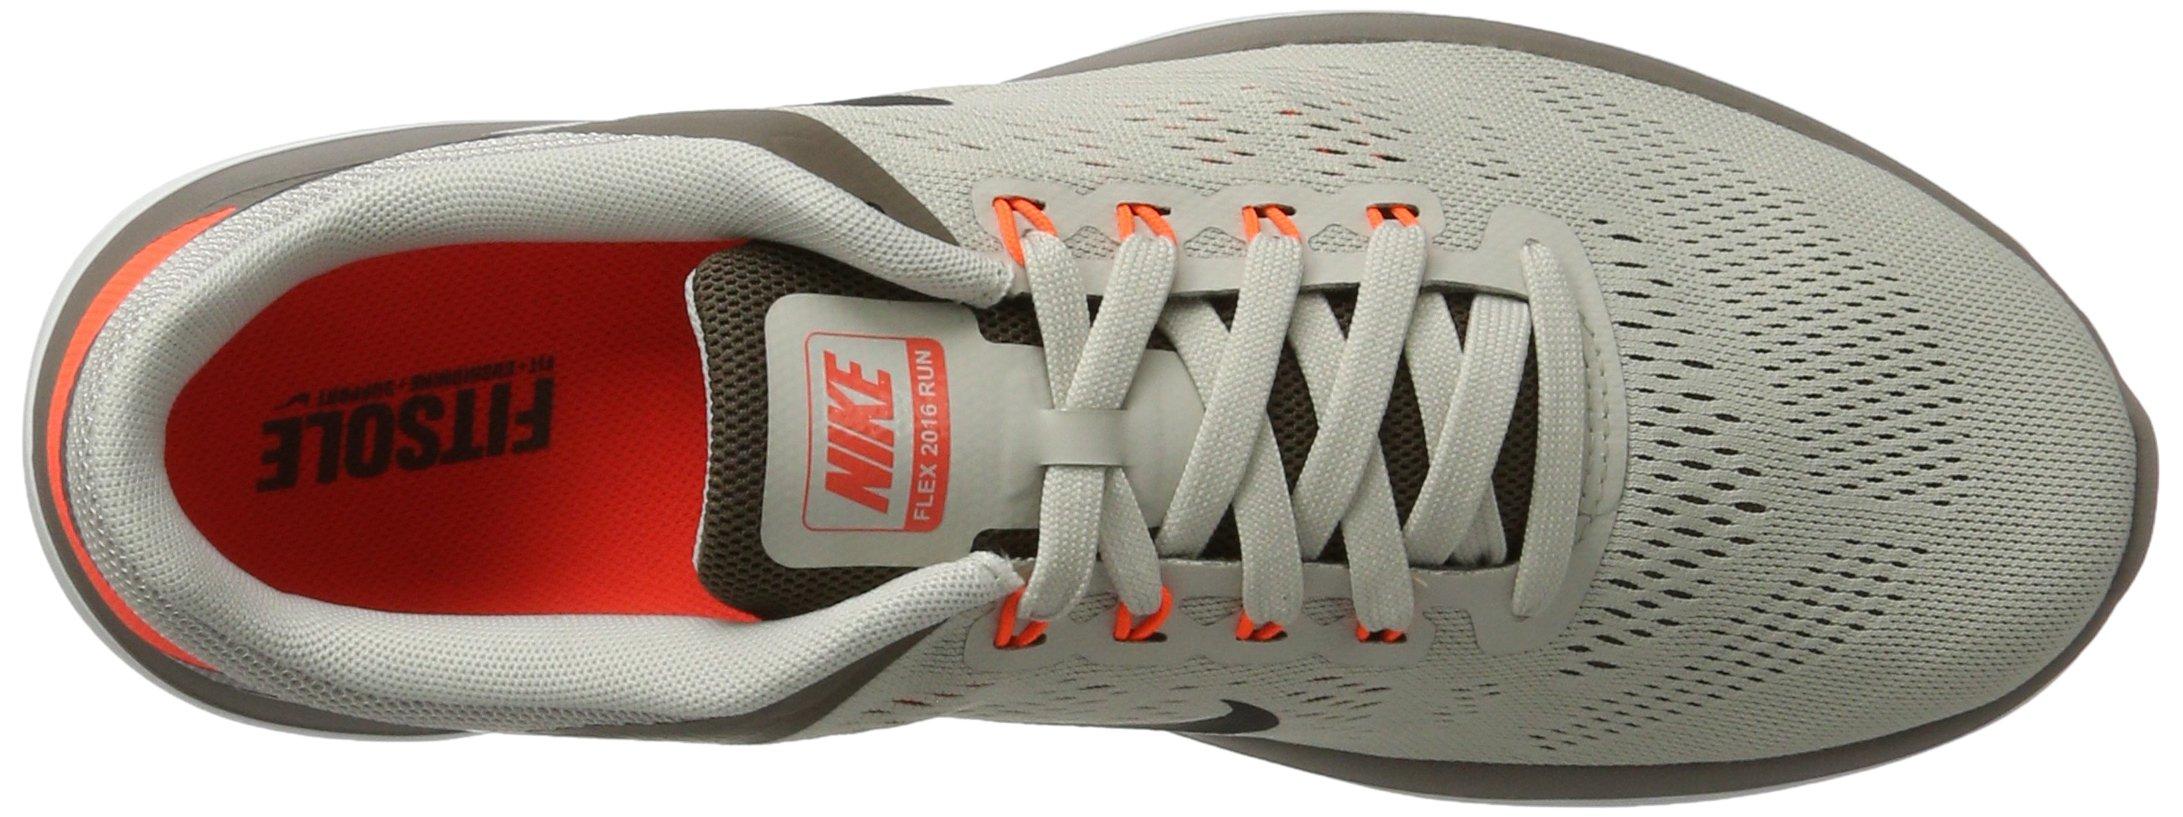 Nike Mens Flex 2016 RN Running Shoe Light Bone/Dark Mushroom/Hyper Orange/Black 8.5 D(M) US by NIKE (Image #7)